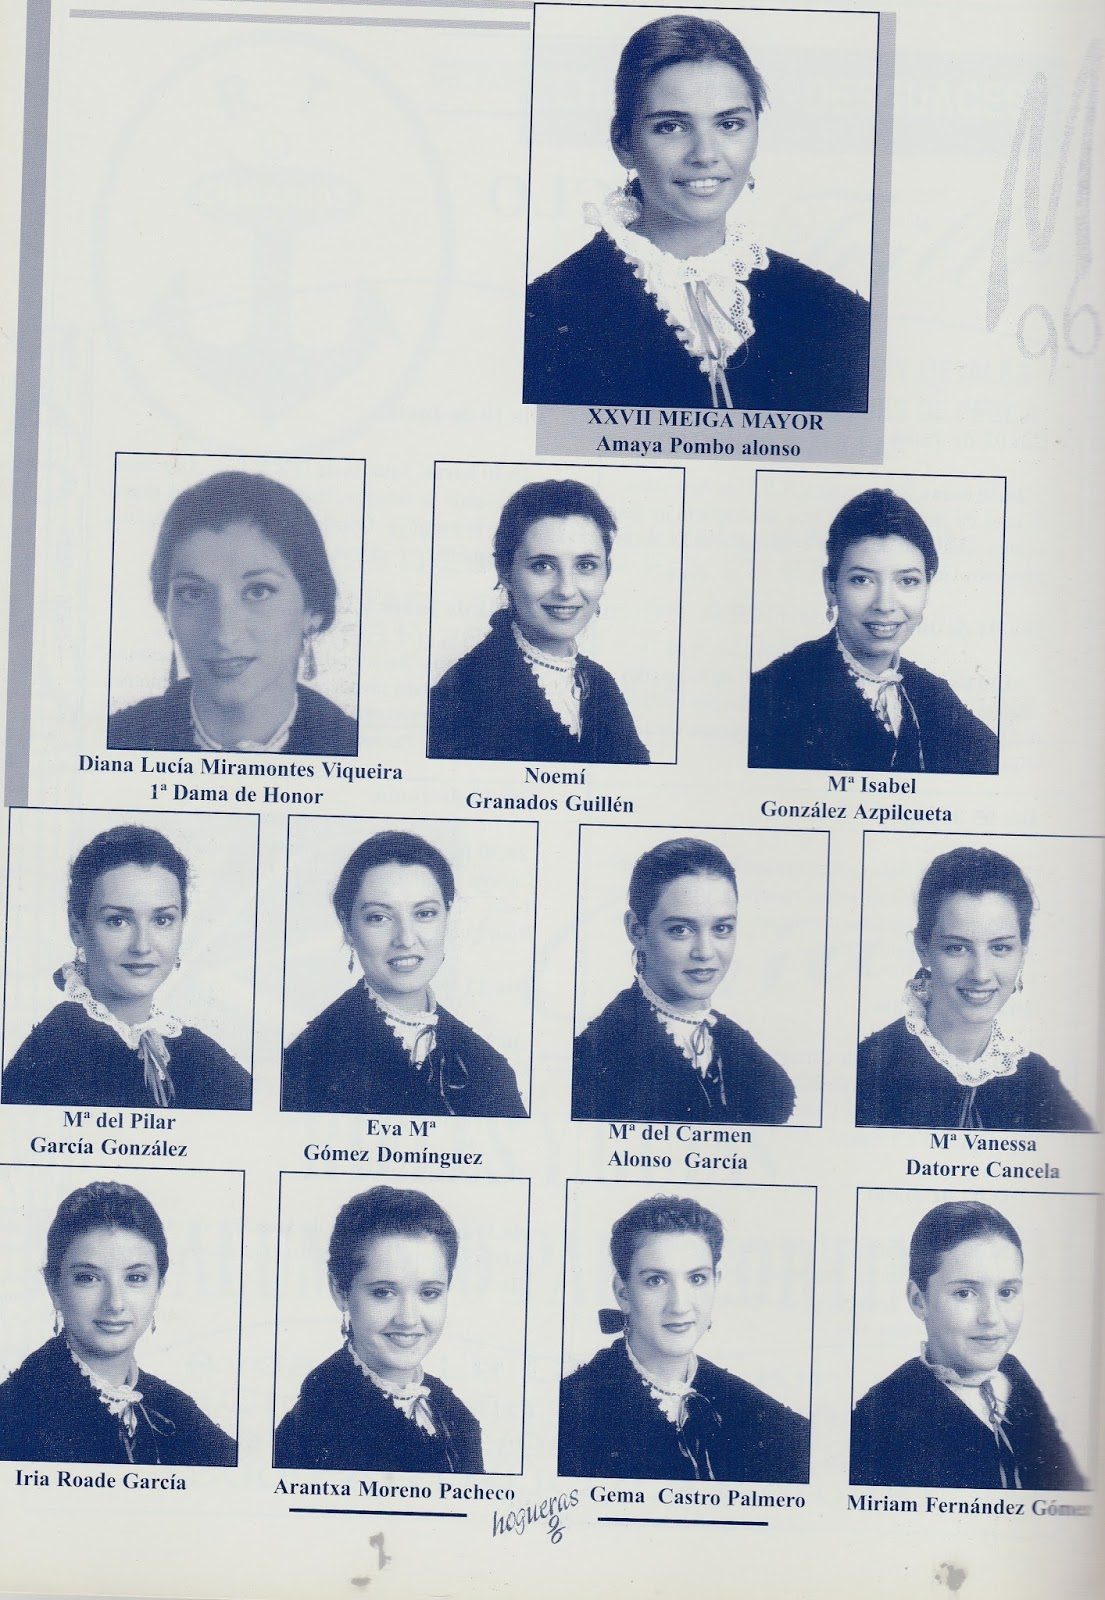 Meigas 1996 amaya pombo alonso xxvii meiga mayor - Maria del carmen castro ...